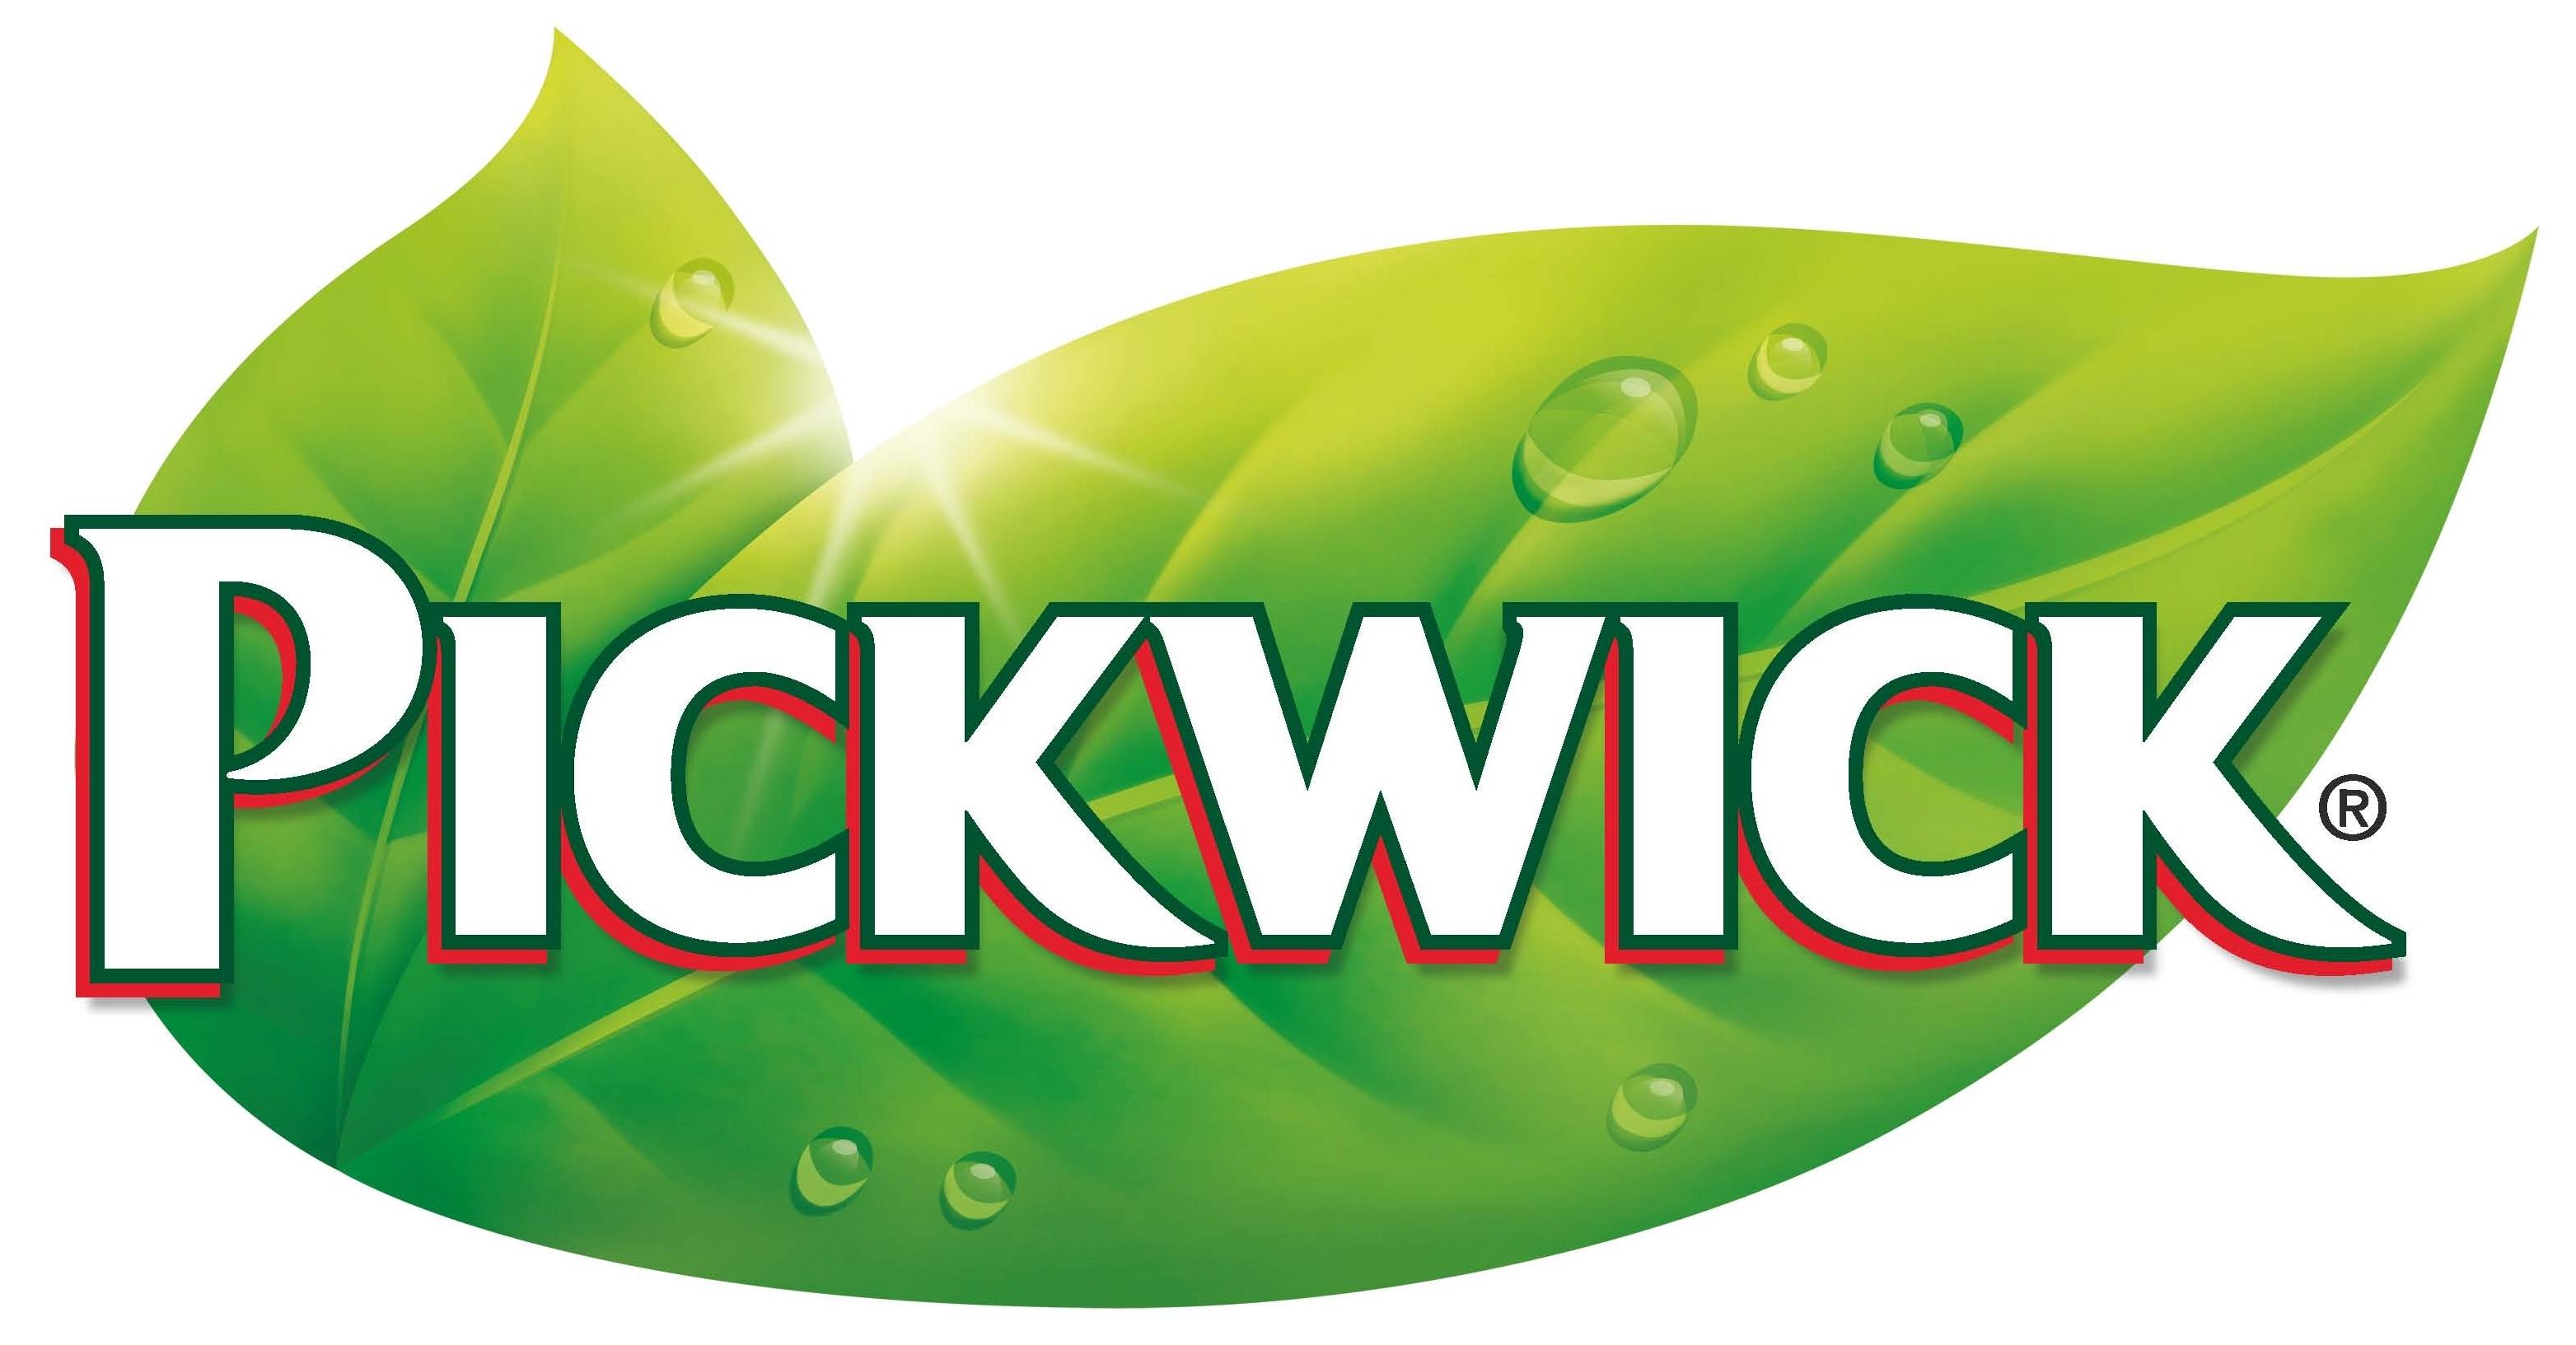 Pickwick Tea logo, logotype